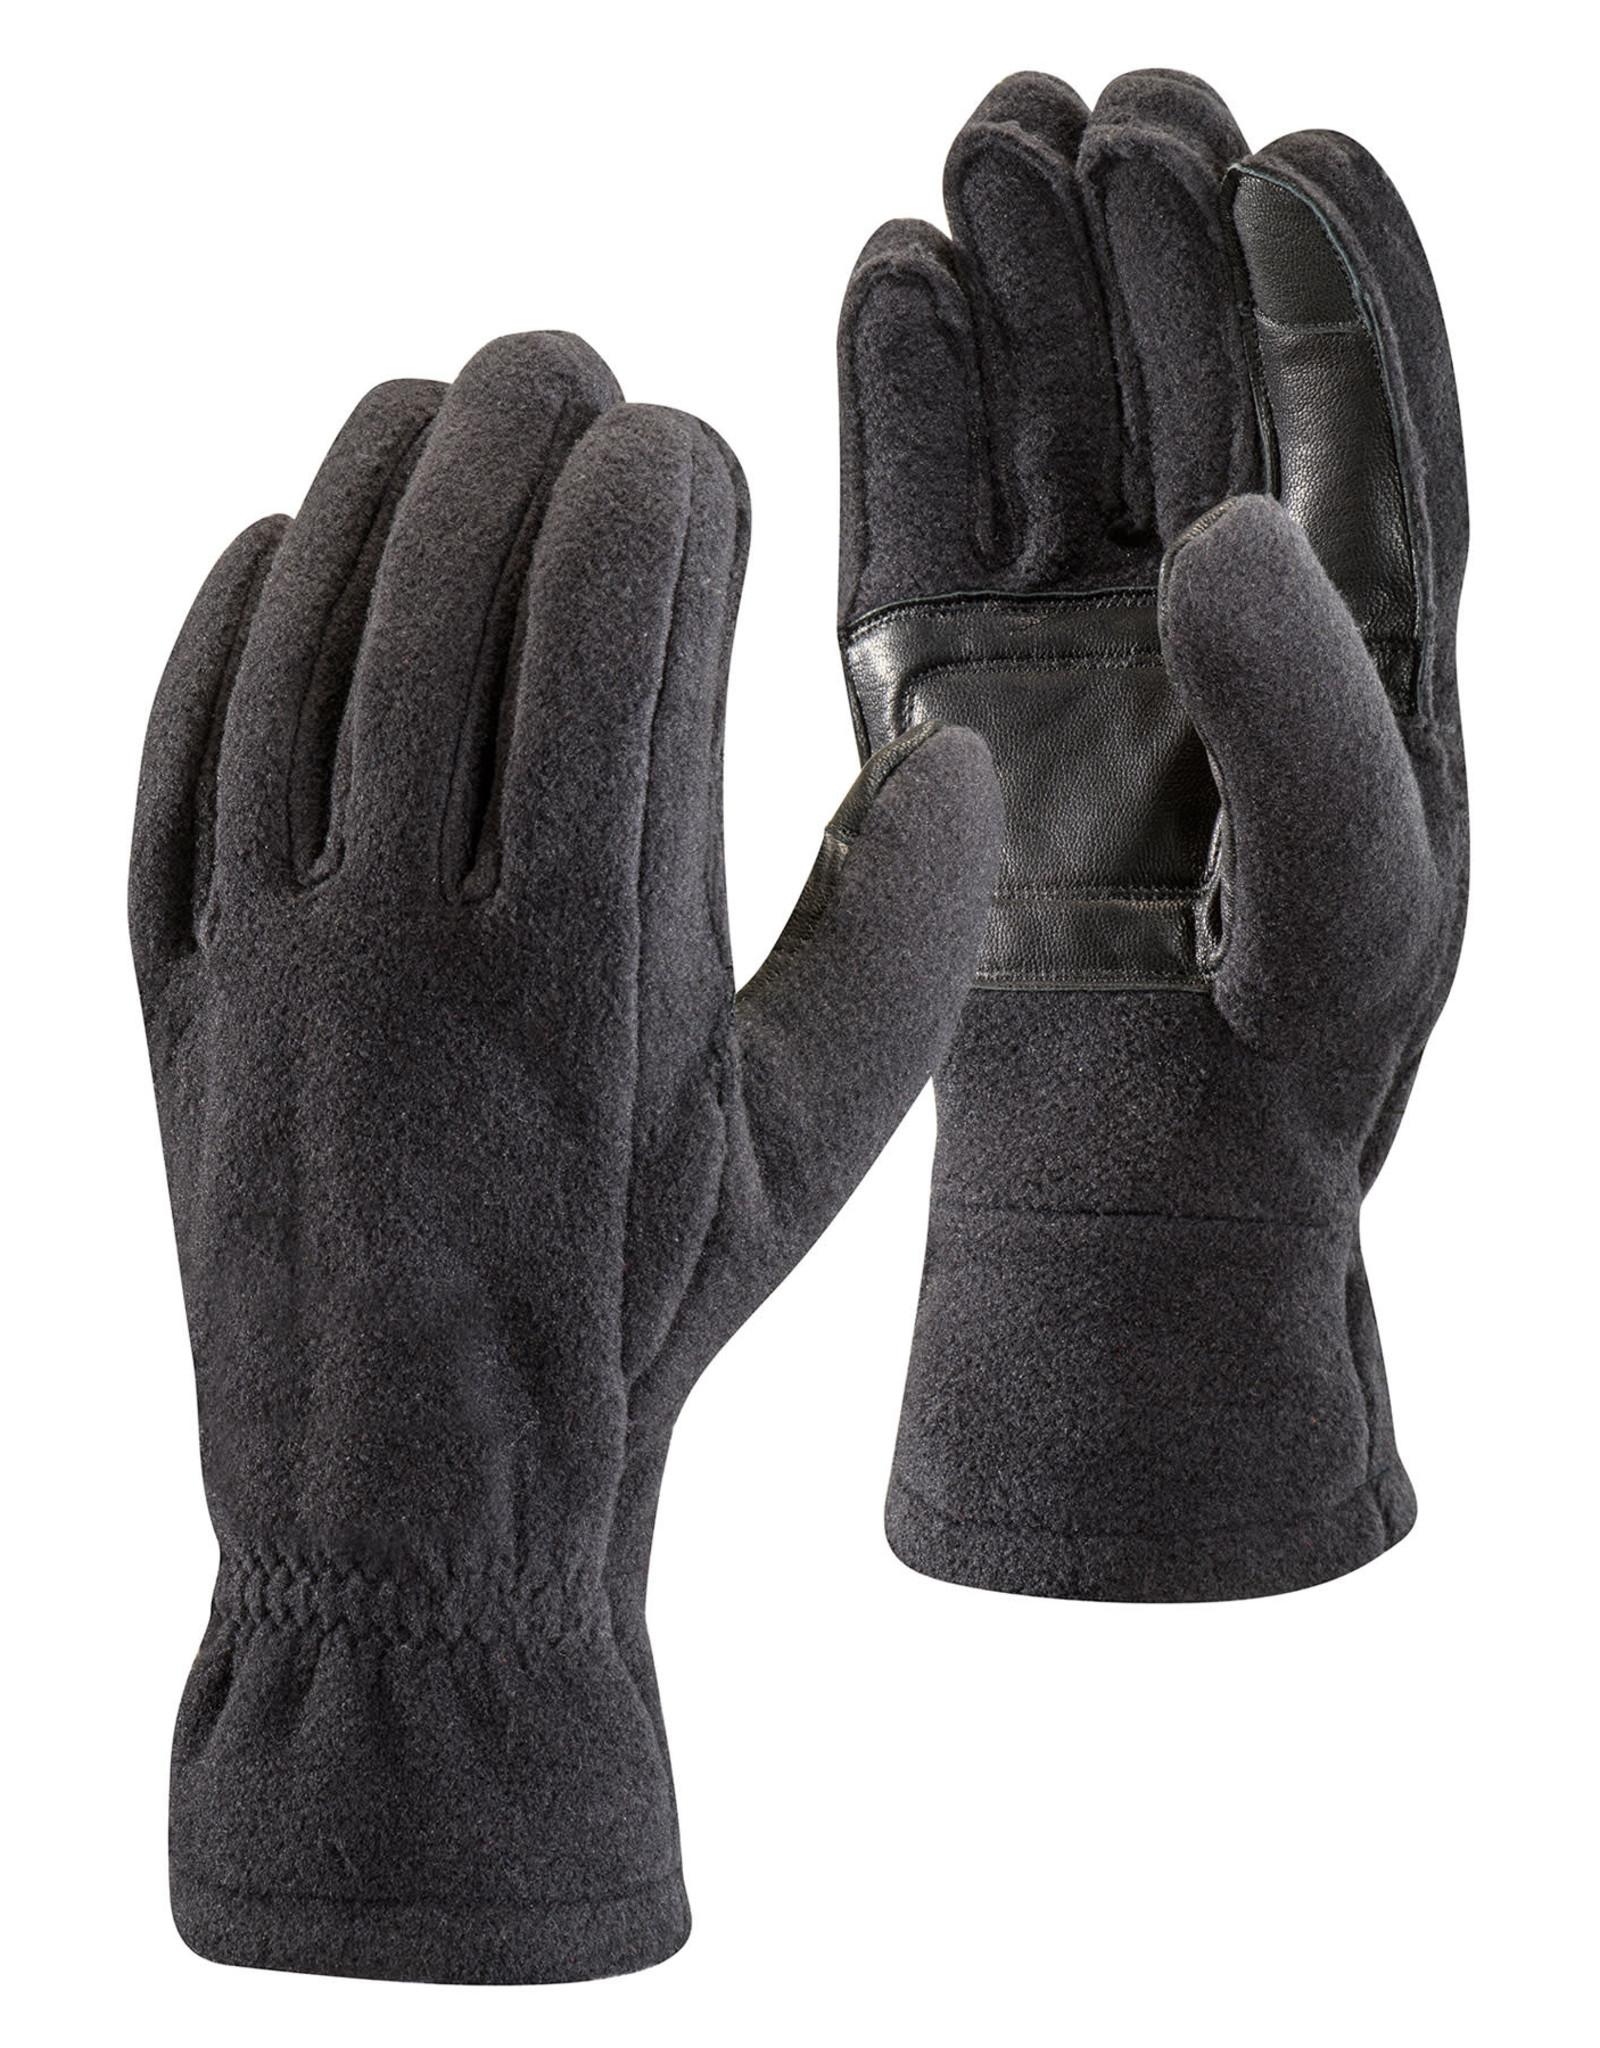 Black Diamond Midweight Fleece Liner Glove